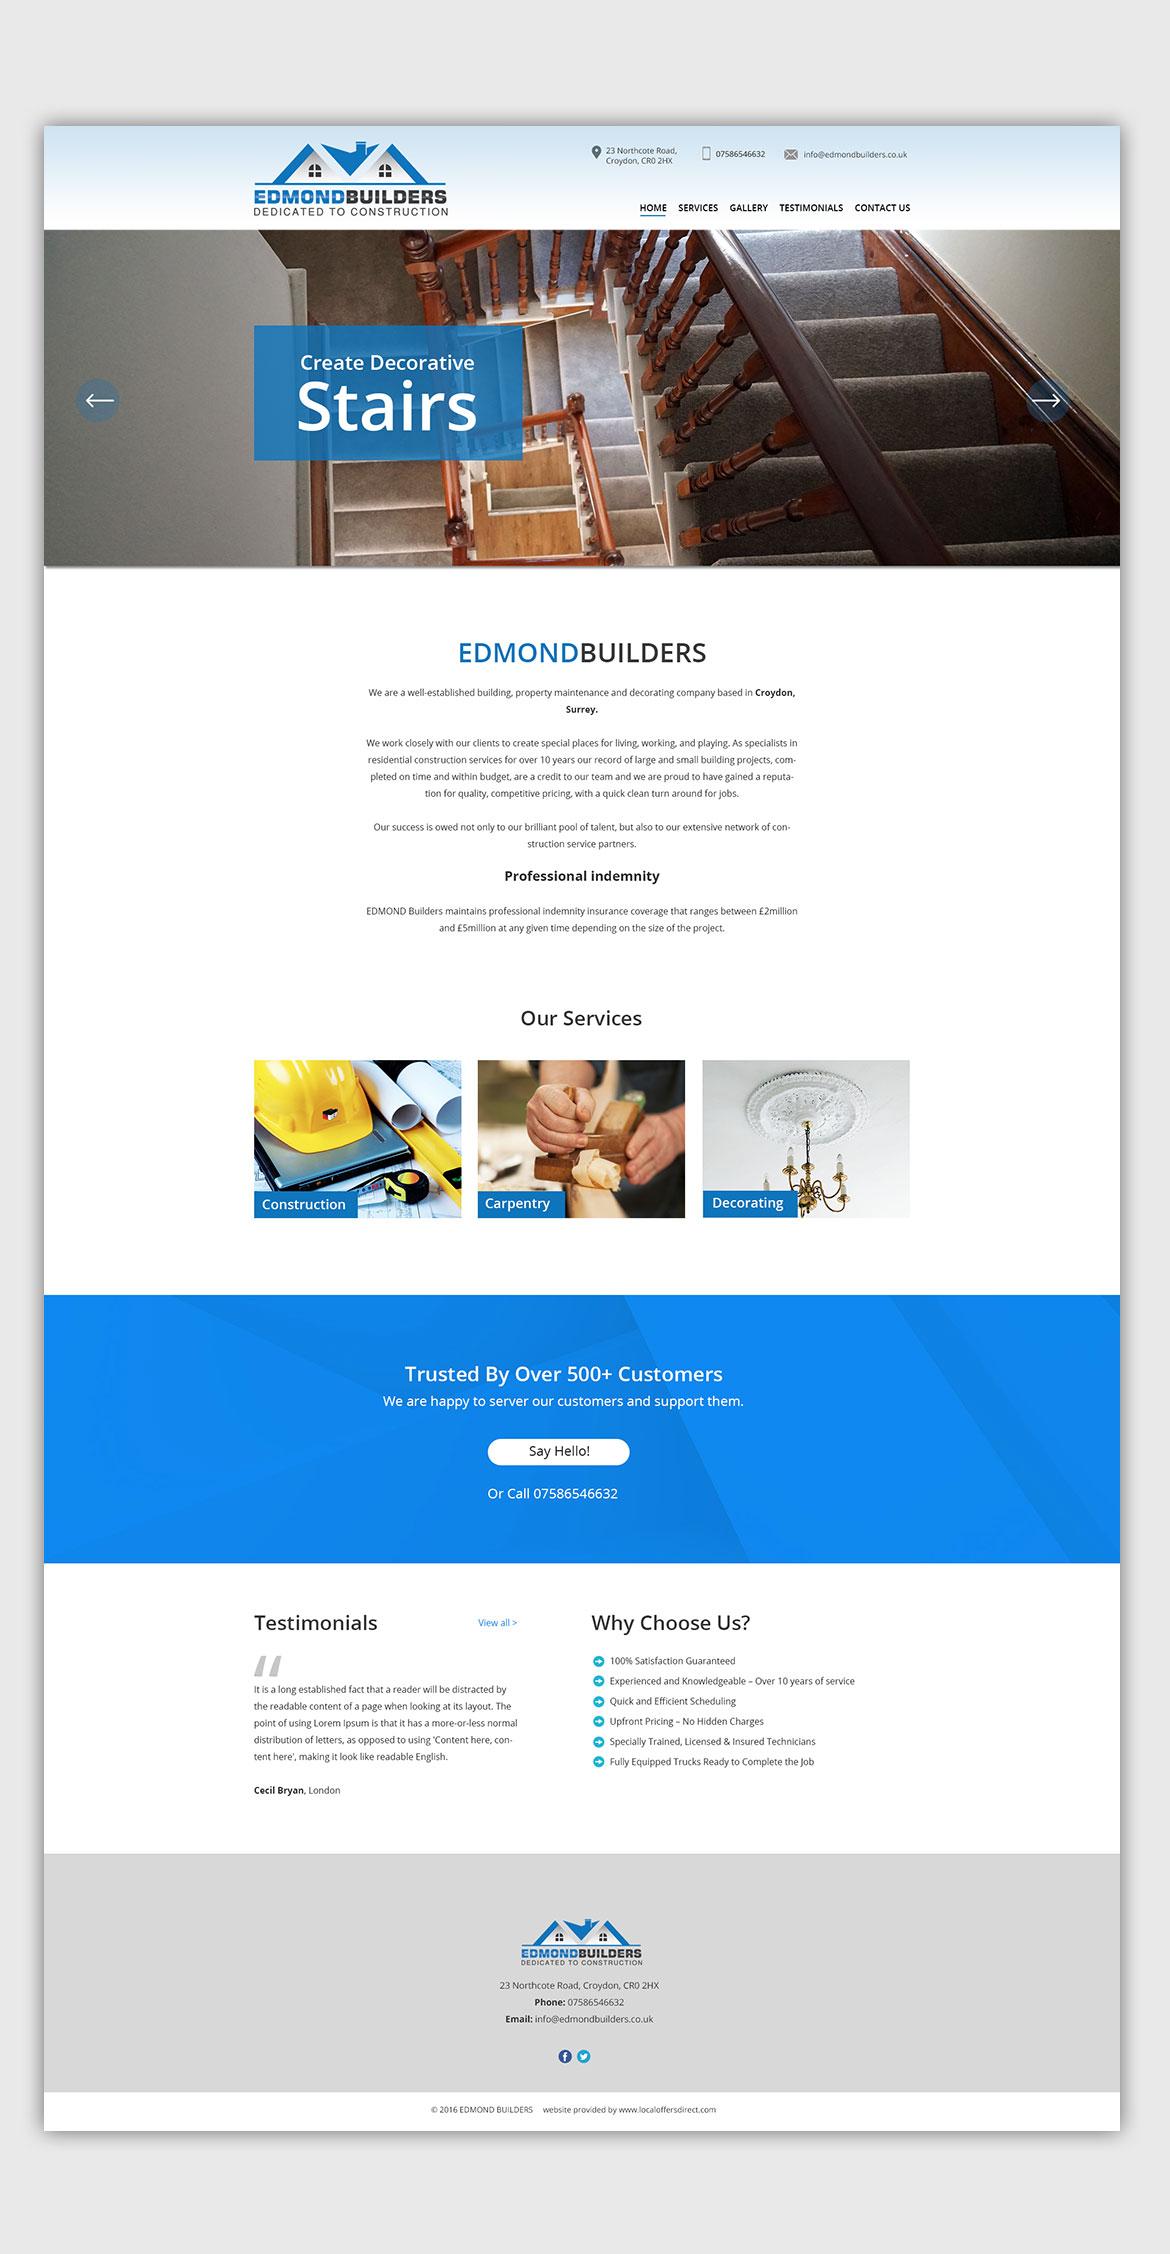 property-maintenace-company-web-design-uk-home-page-main